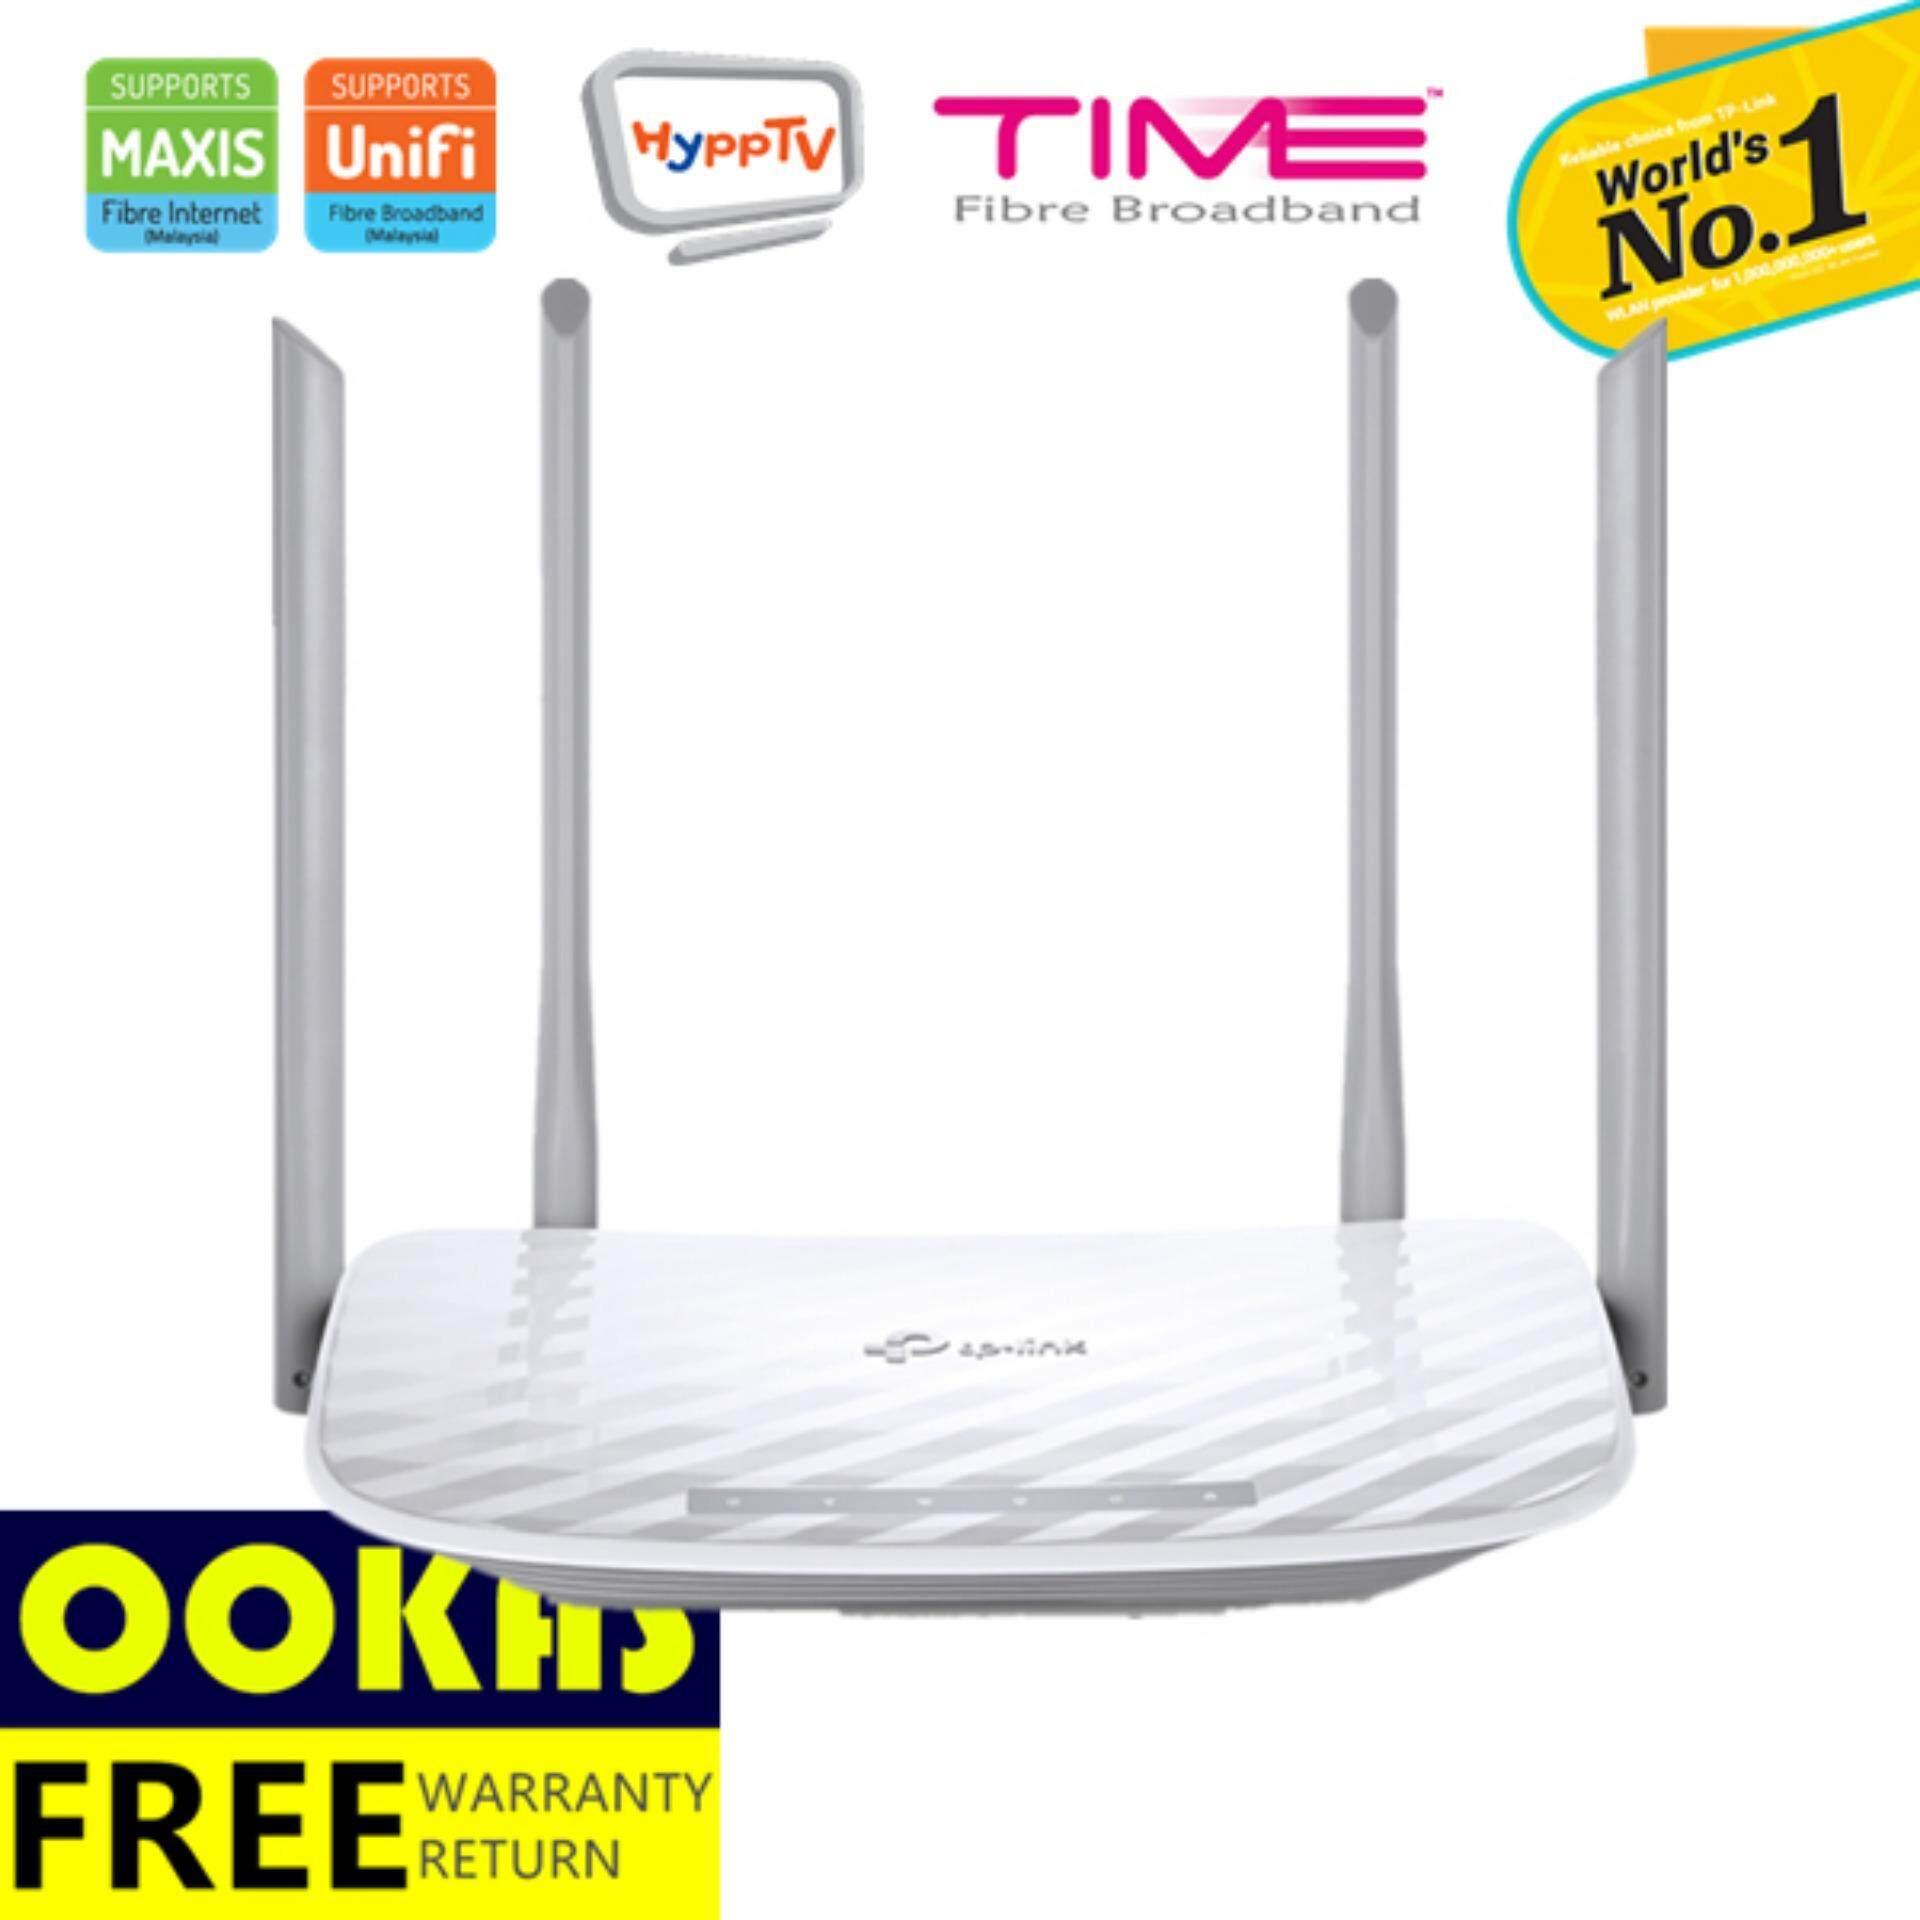 Fitur D Link Wireless Ac1900 Dual Band Gigabit Cloud Gaming Router Dir 842 Ac1200 Tp Archer C50 24 5ghz Wifi Unifi Maxis